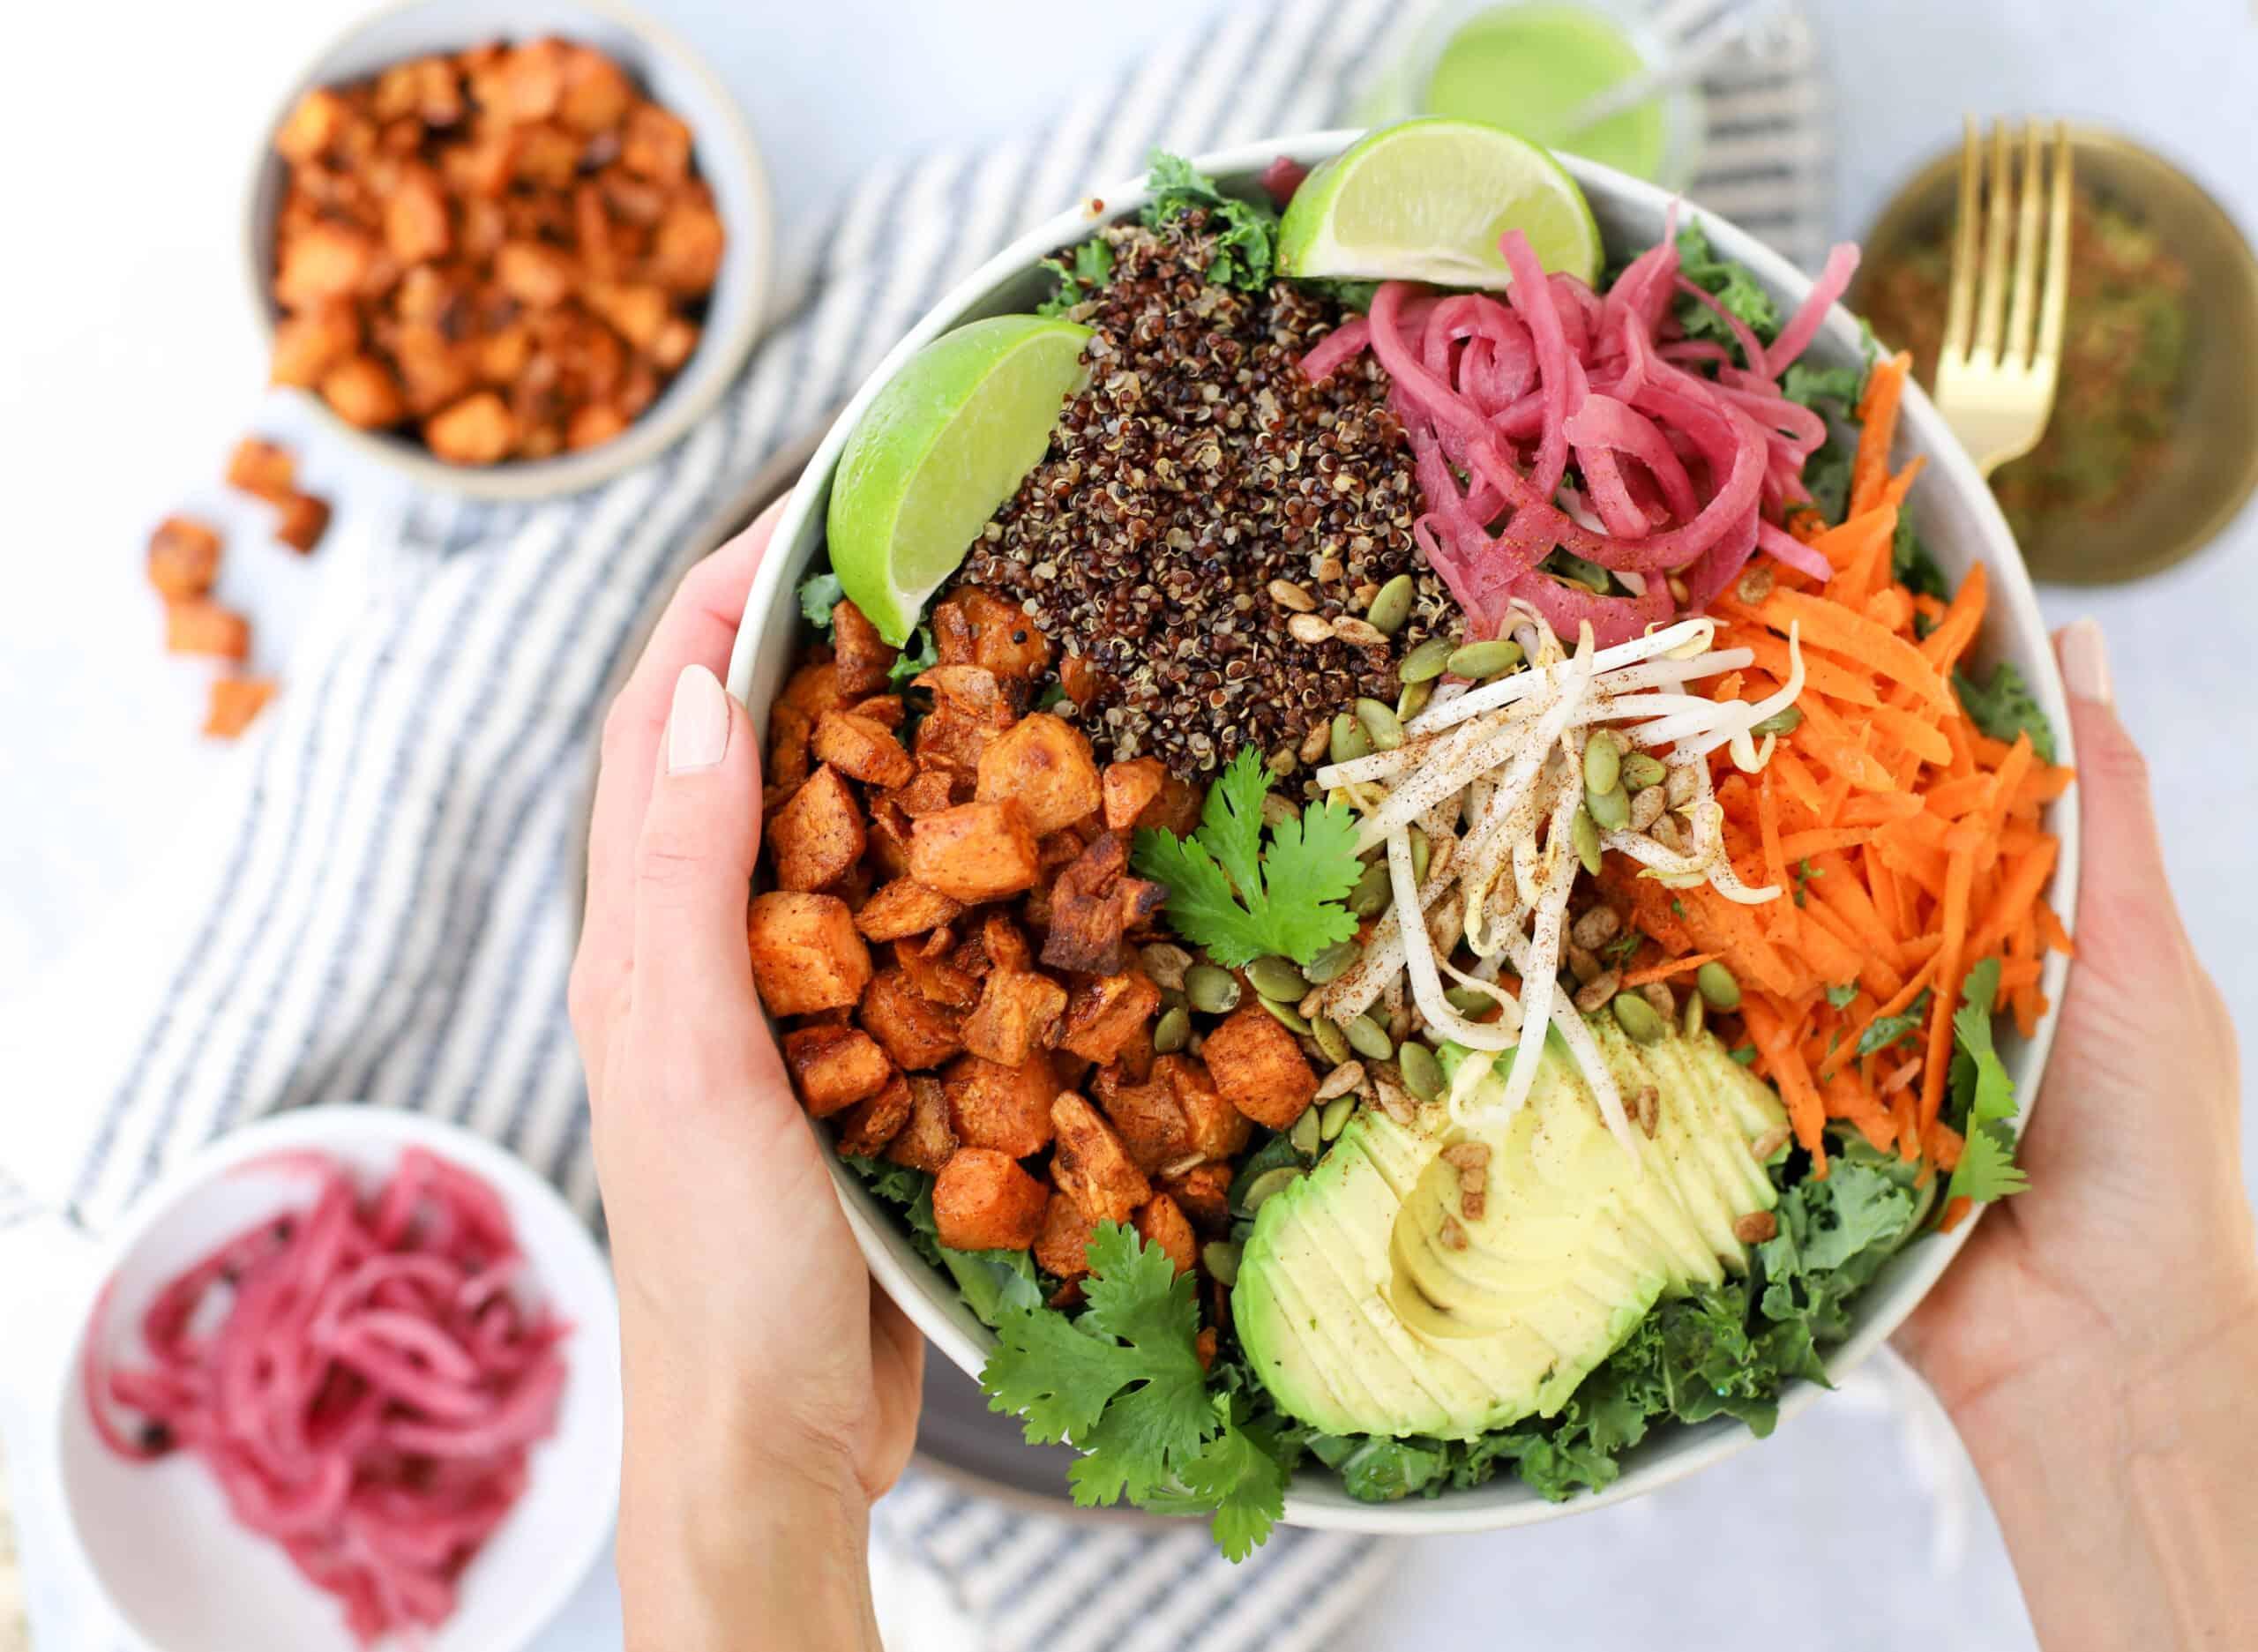 Copycat Sweetgreen's salad recipe